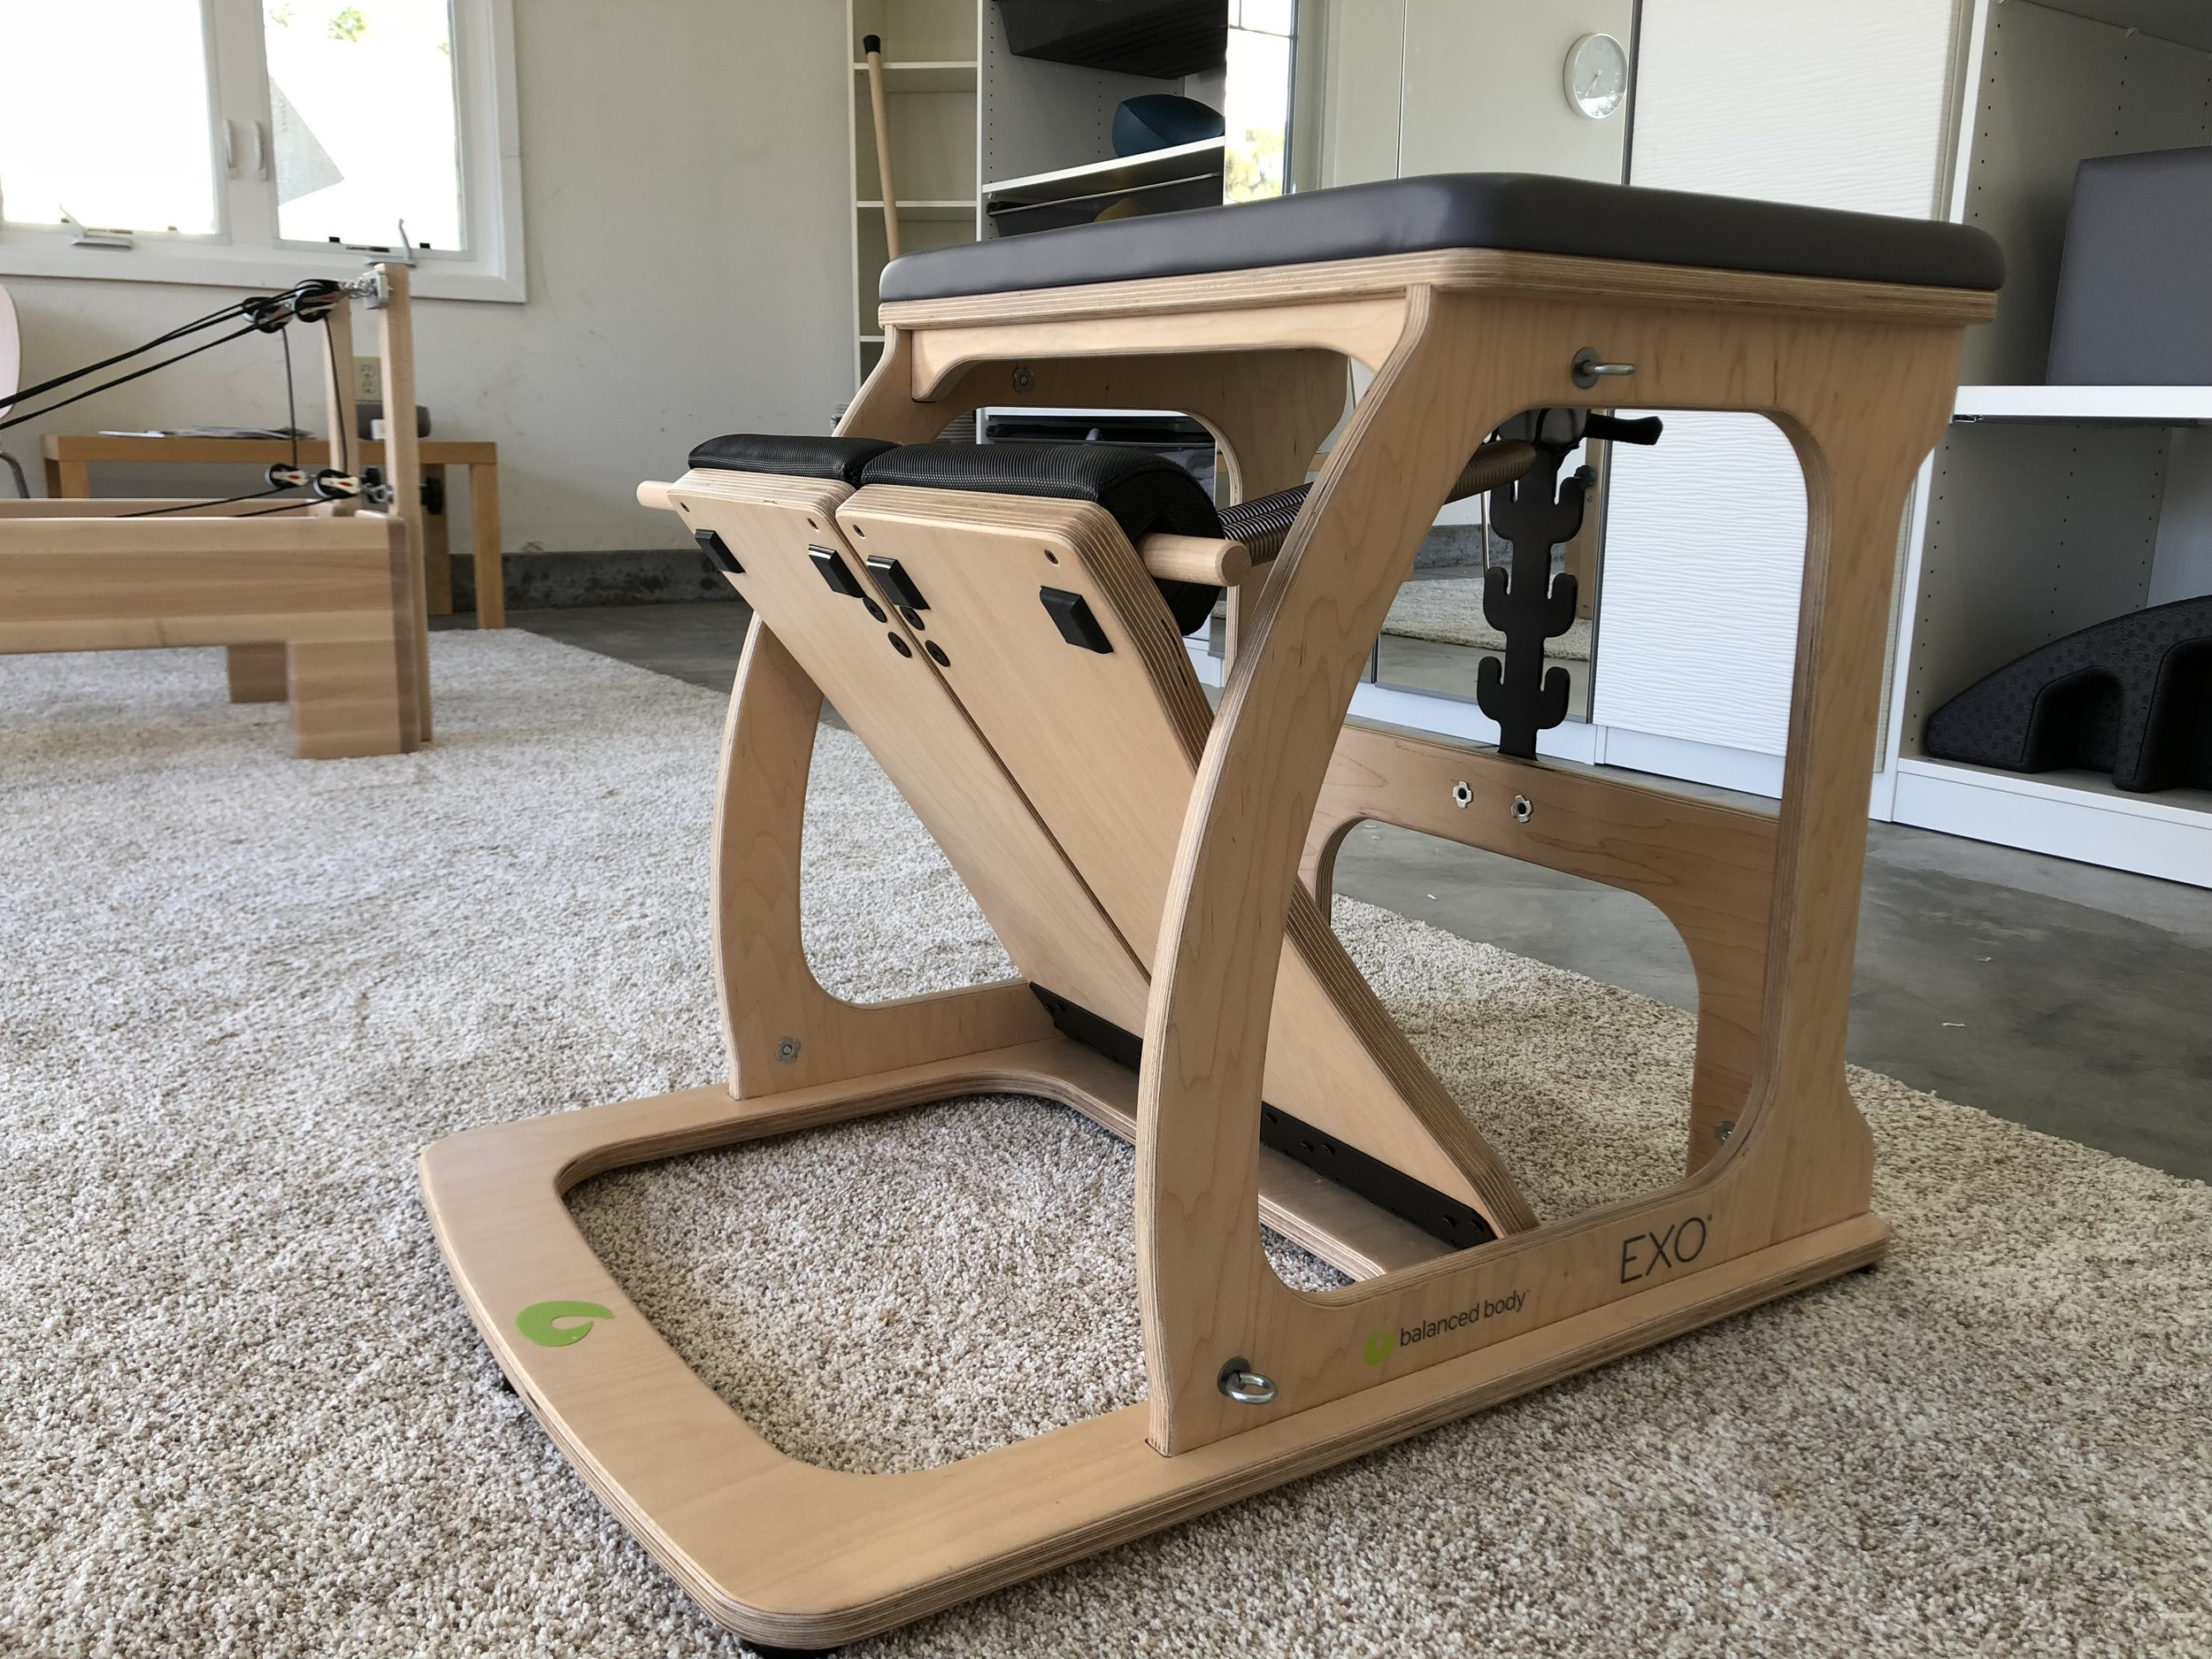 EXO Chair_Pilates_Pilates Chair_Pilates Equipment.jpg